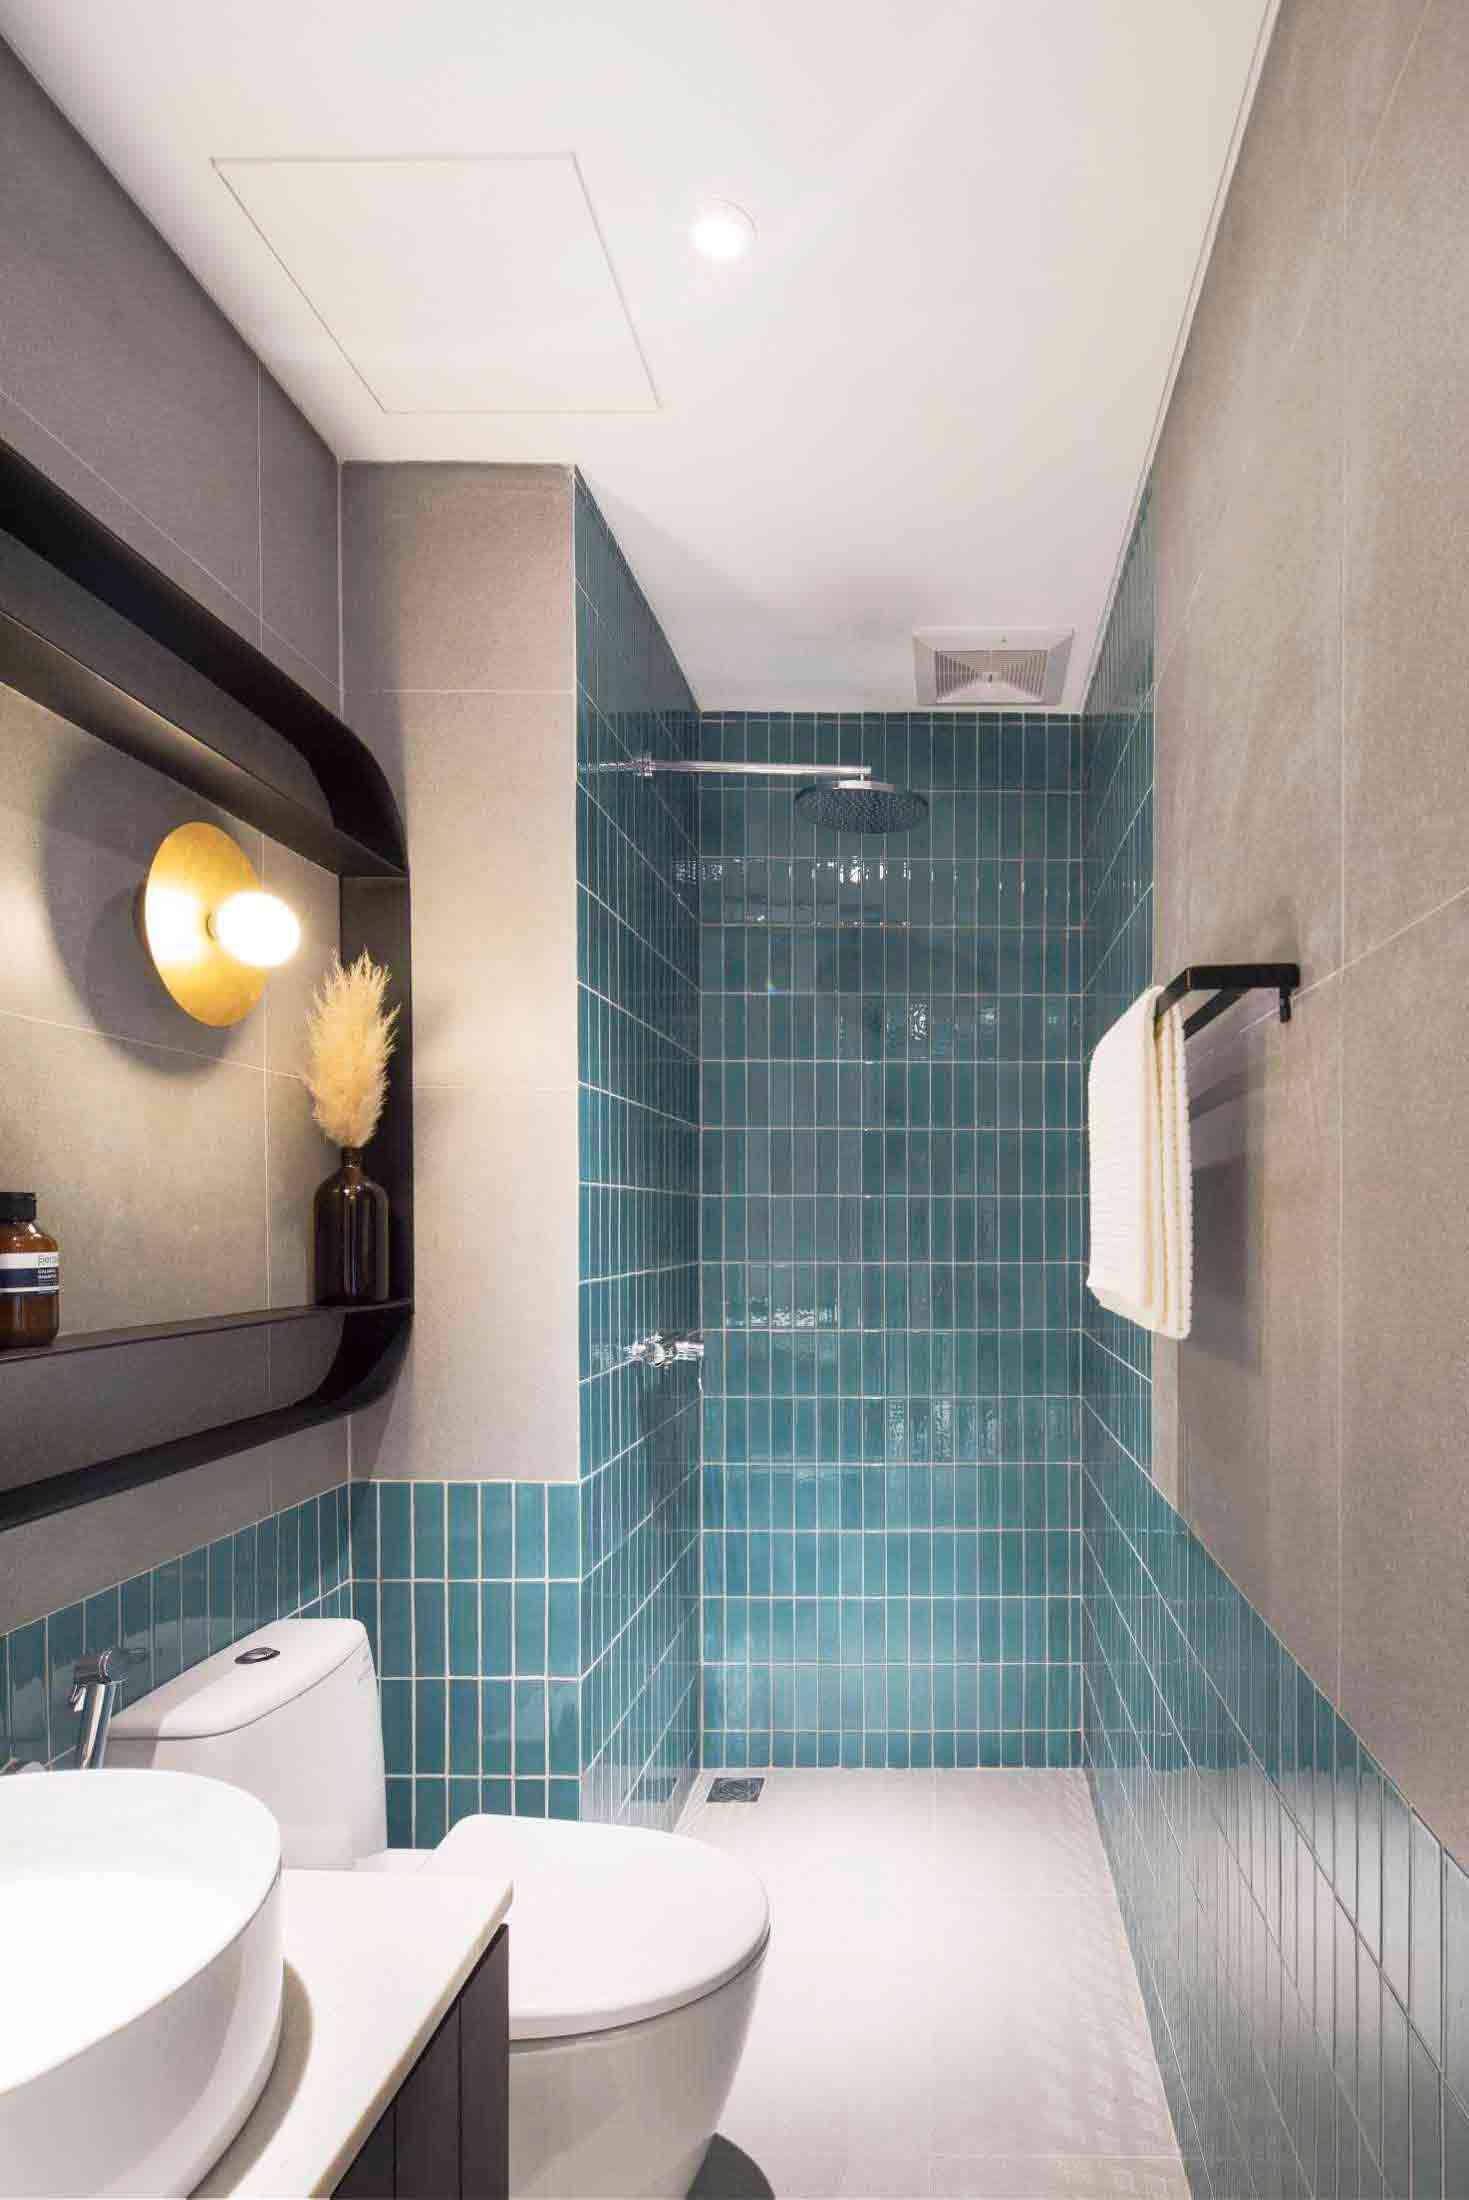 Kamar mandi mungil dengan suasana yang segar, karya Helloembryo, via Arsitag.com